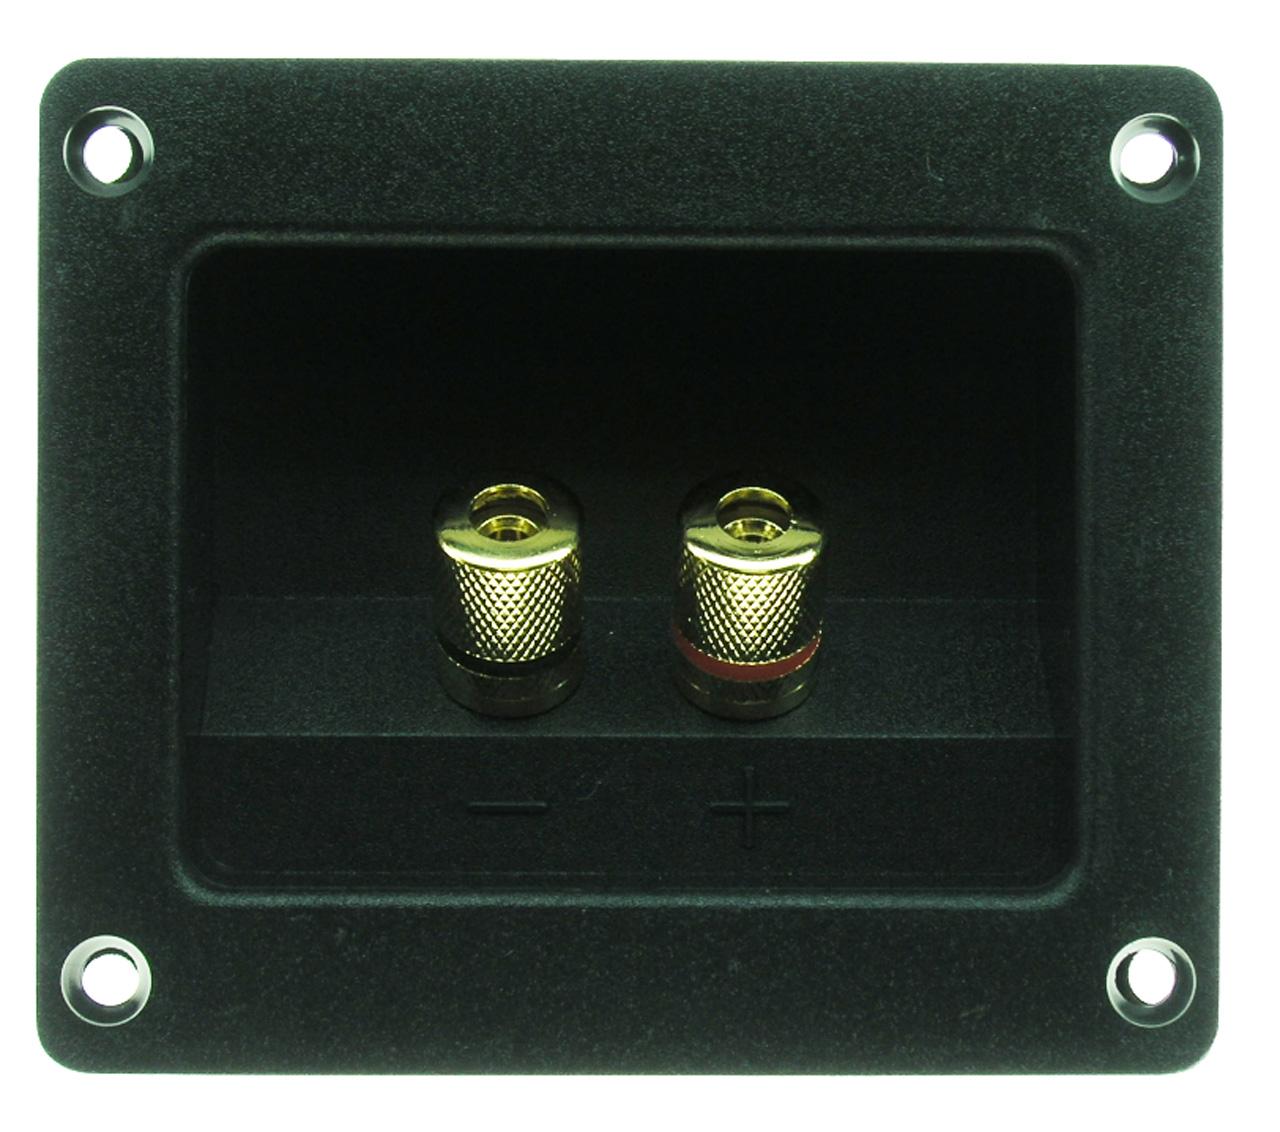 Speaker Terminal Connector, 5 Way Gold Binding Posts, RGT-3000